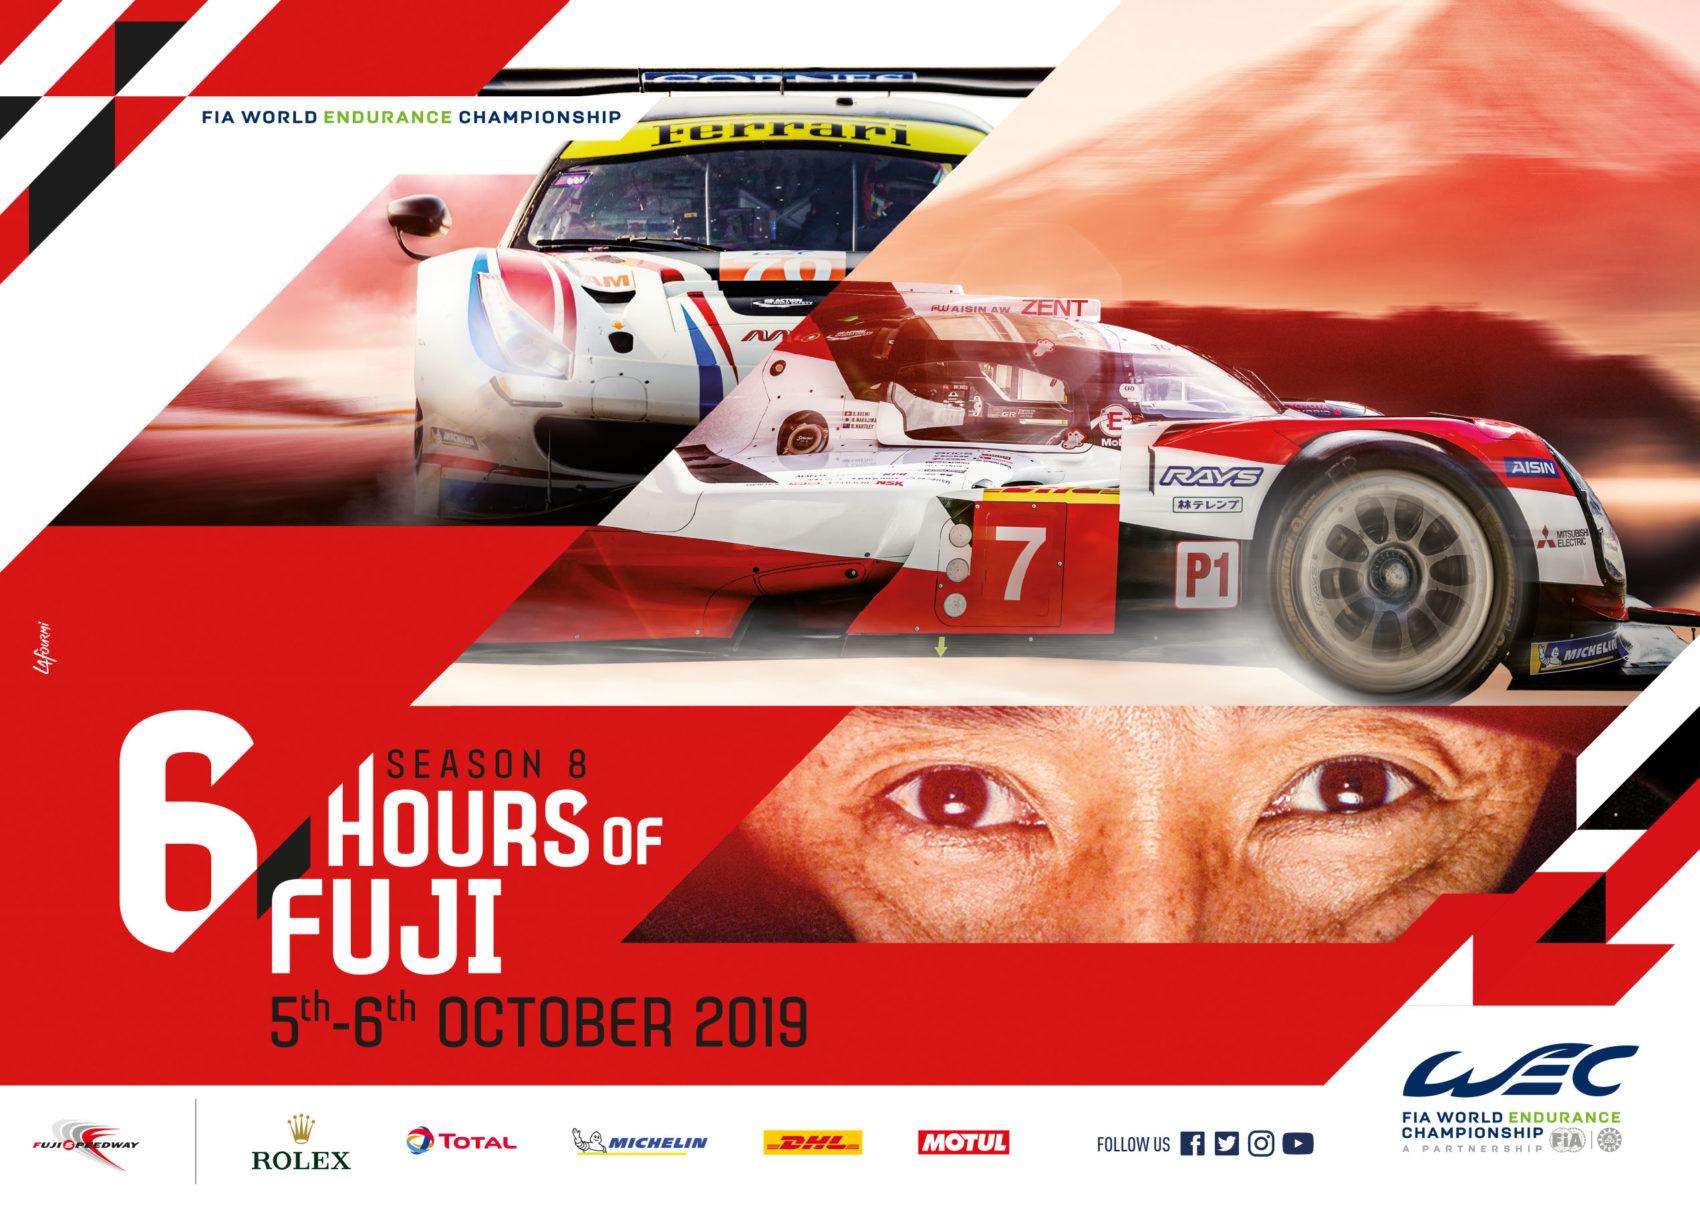 Projet_Project_WEC_FIA_world_endurance_championship_KV_fuji